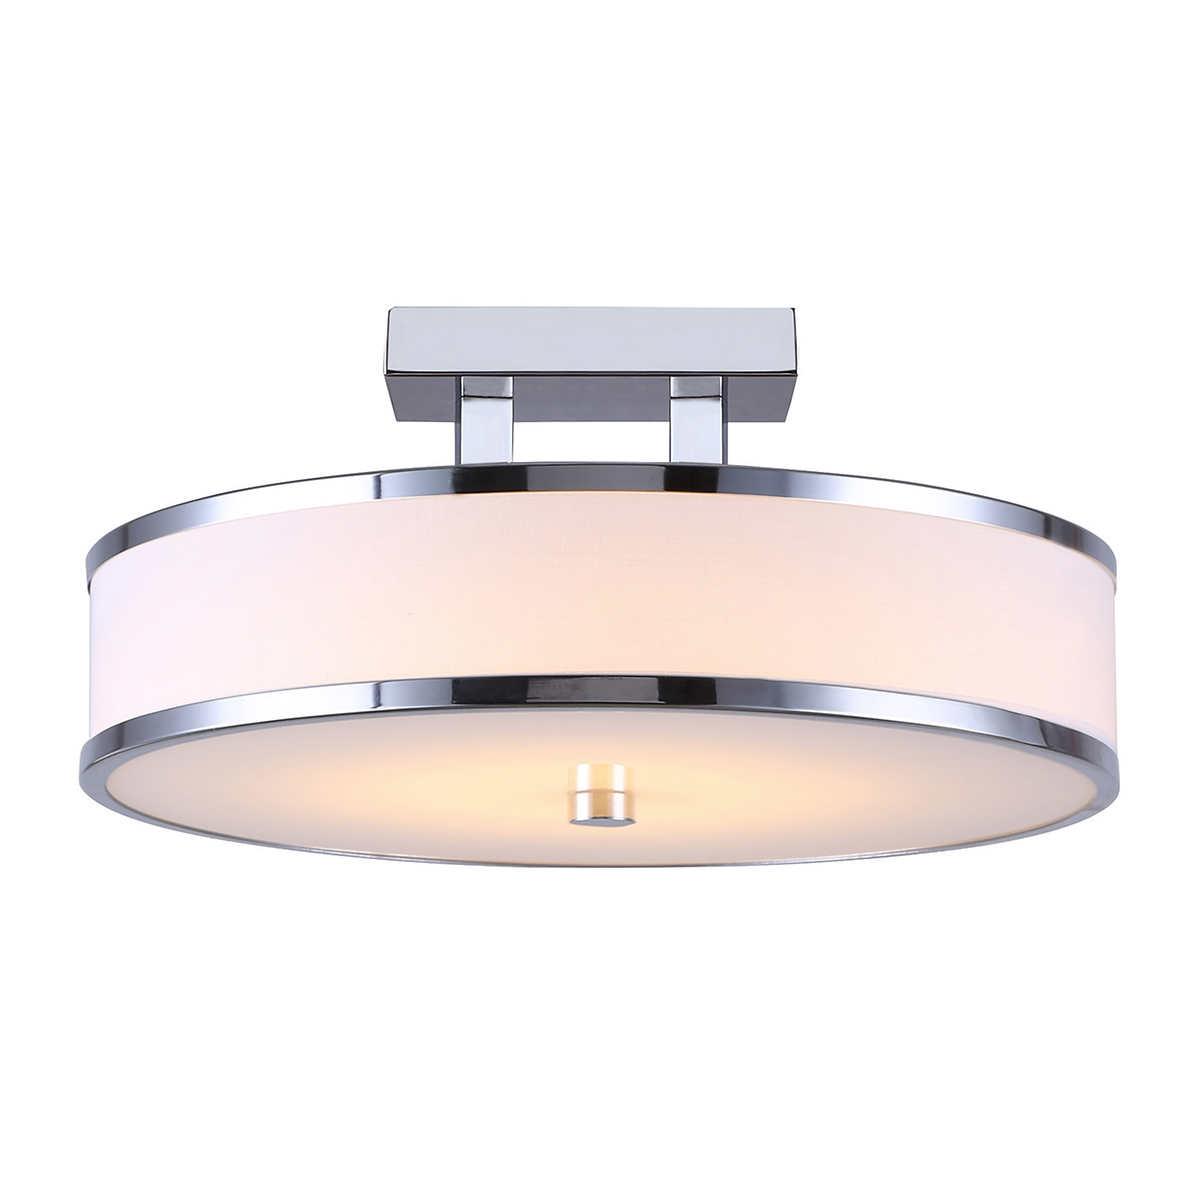 ceiling fixtures  costco - canarm foster led semiflush mount fixture